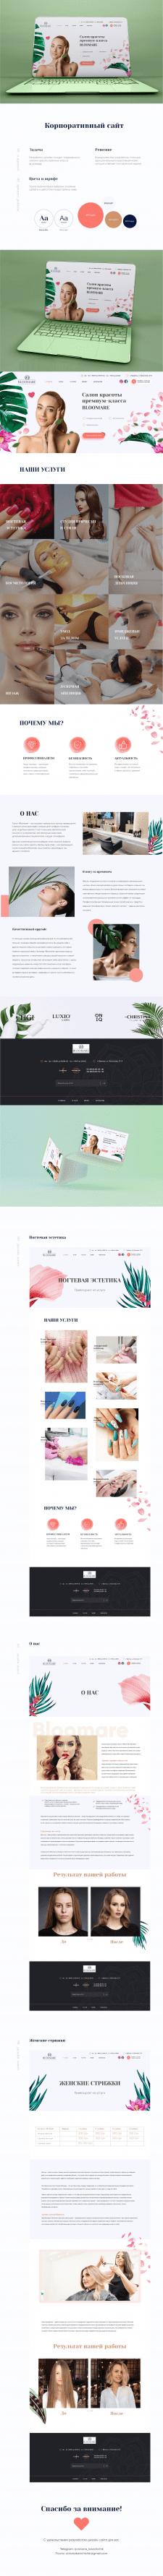 #Дизайн сайта визитки салона красоты